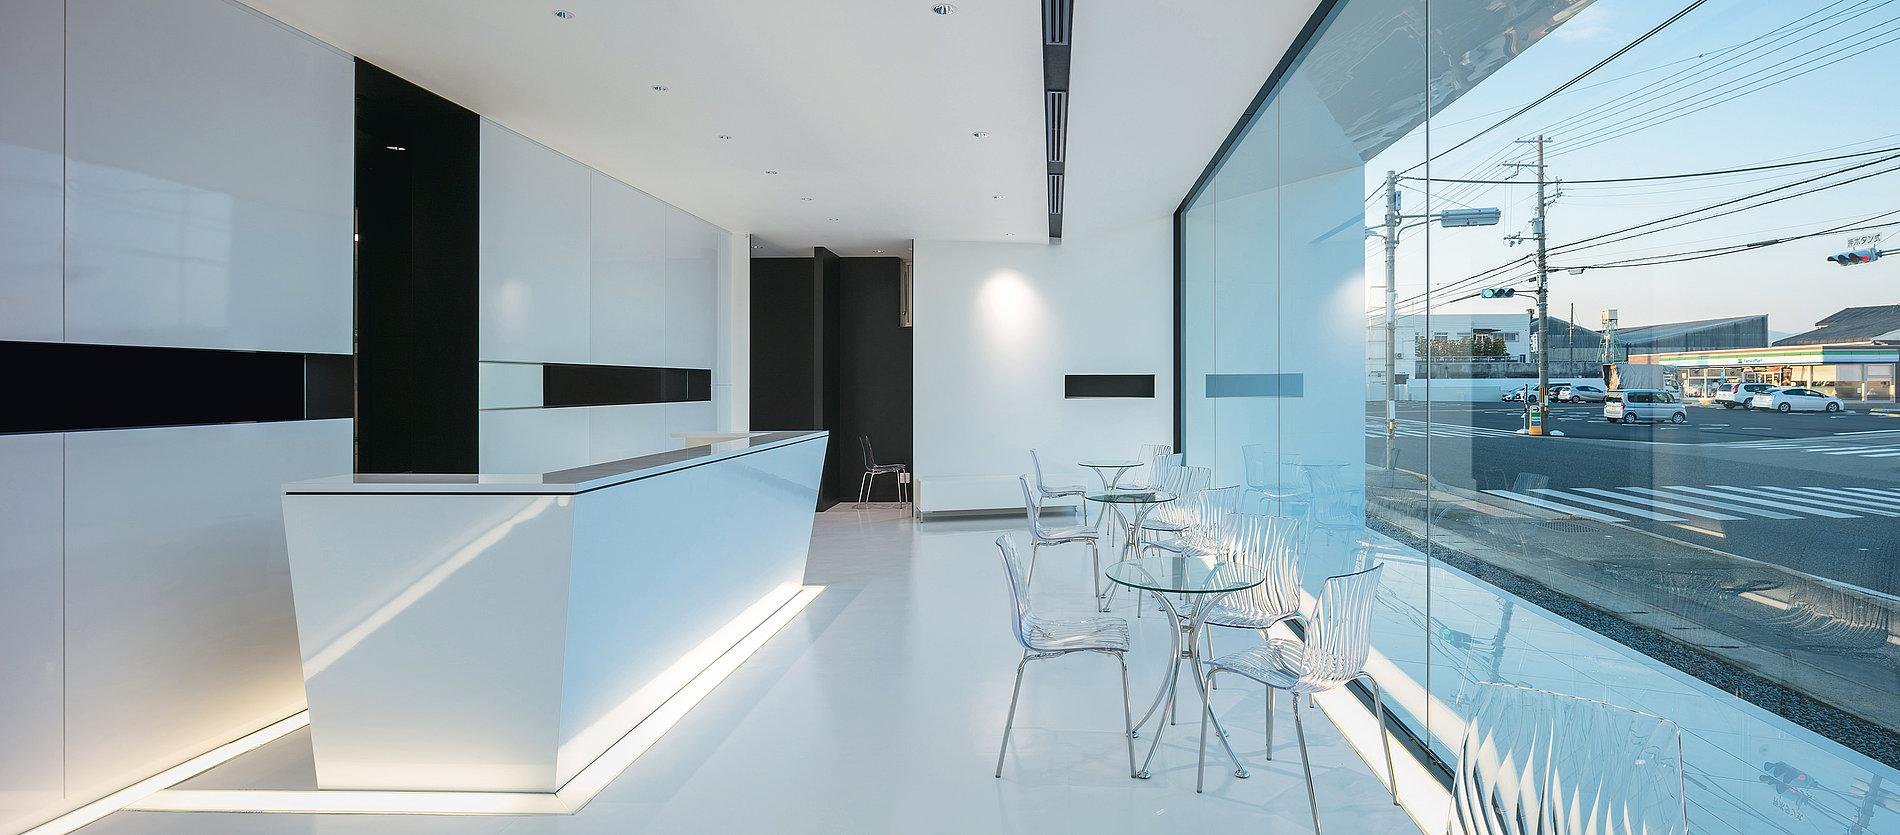 The Cutting Edge Pharmacy | Red Dot Design Award